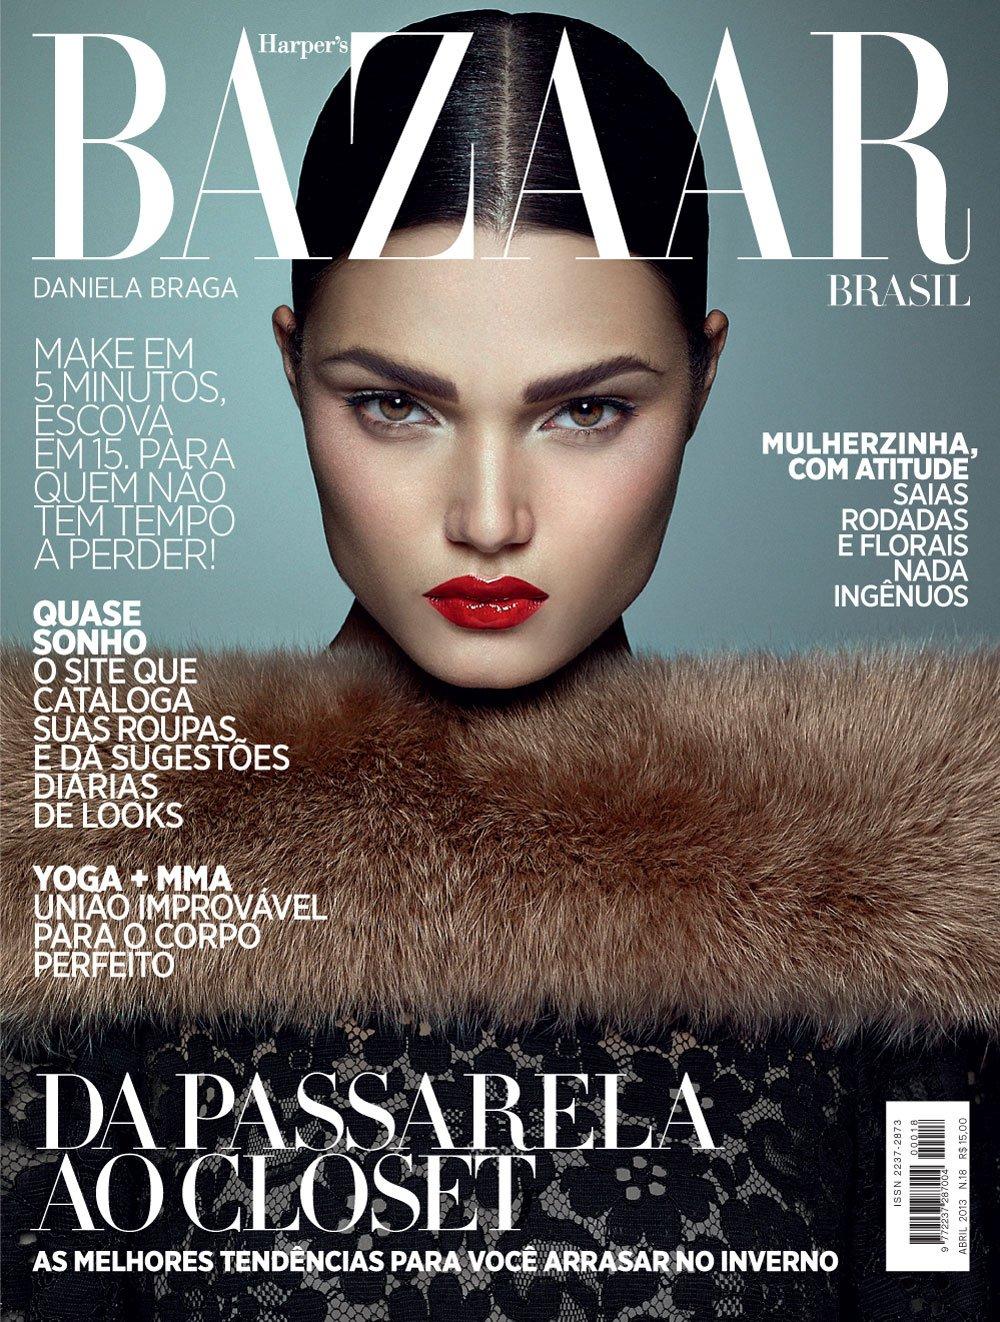 daniela-braga-by-gui-paganini-for-harper_s-bazaar-brazil-april-2013.jpg